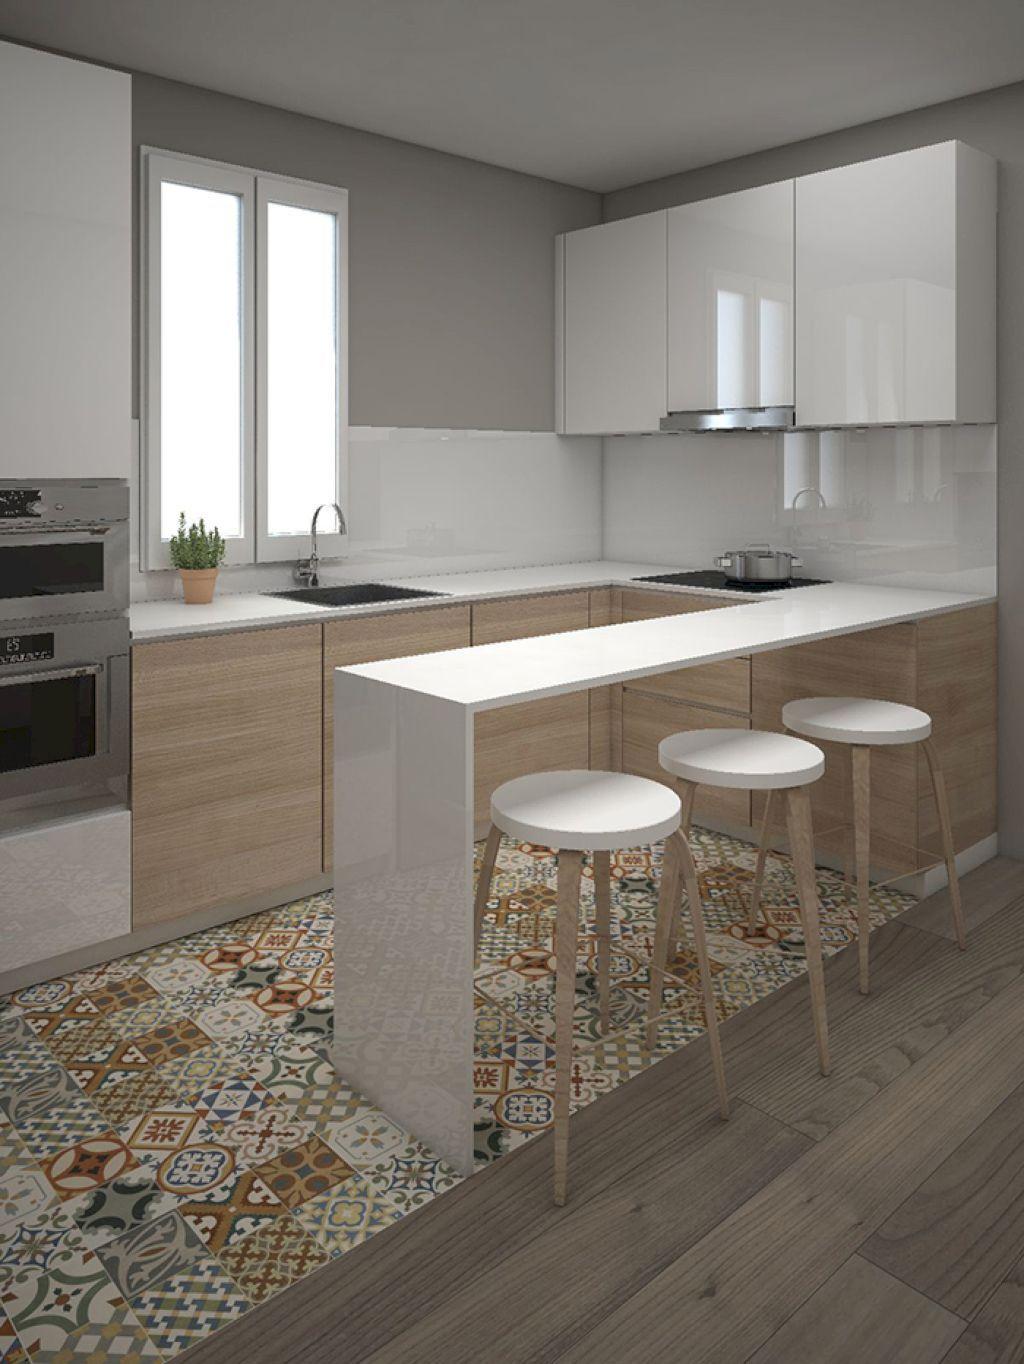 Cool 45 Modern Contemporary Kitchen Ideas Https://homeylife.com/45